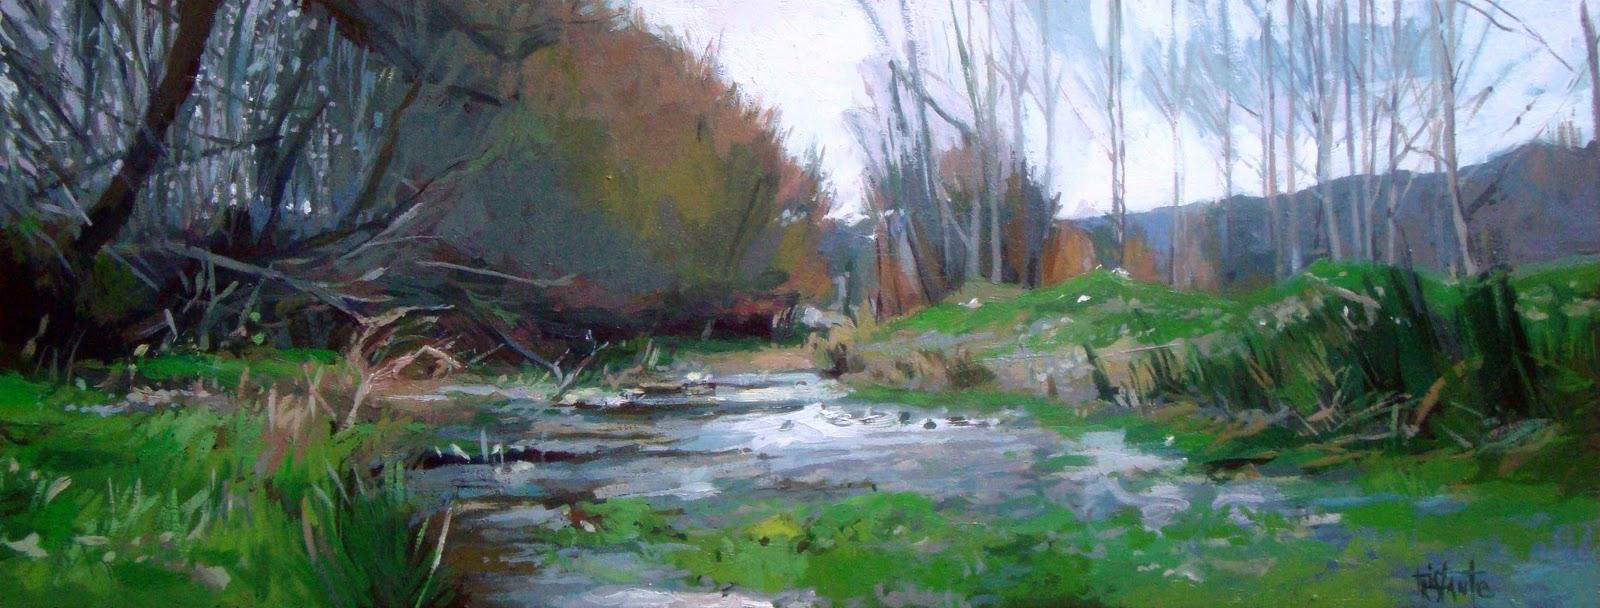 """Border´s river"" original fine art by Víctor Tristante"